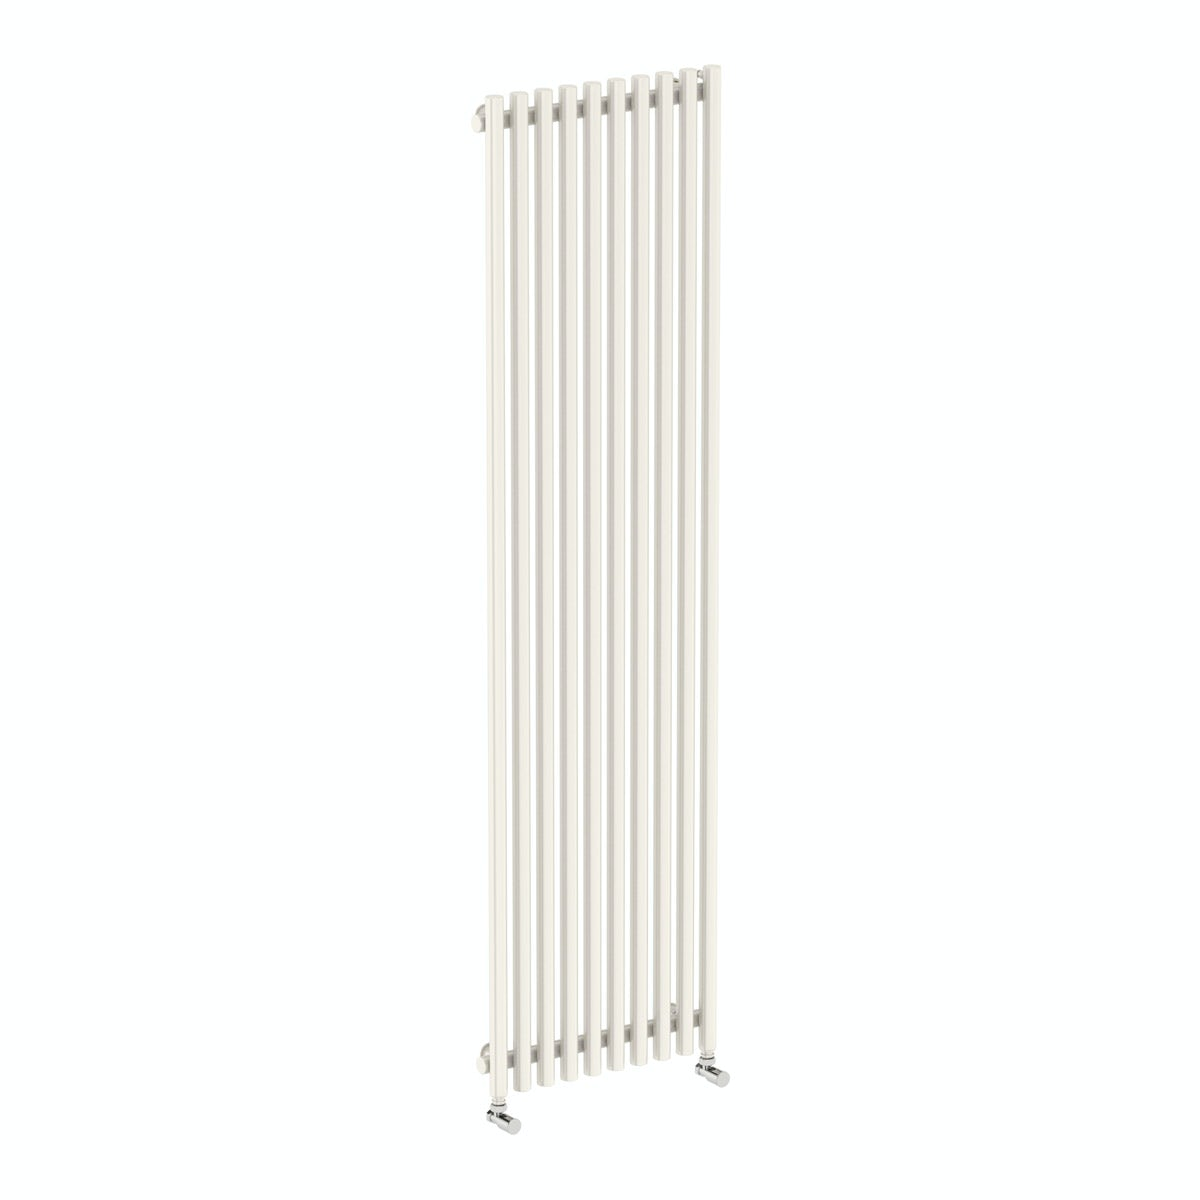 Terma Tune soft white single vertical radiator 1800 x 490